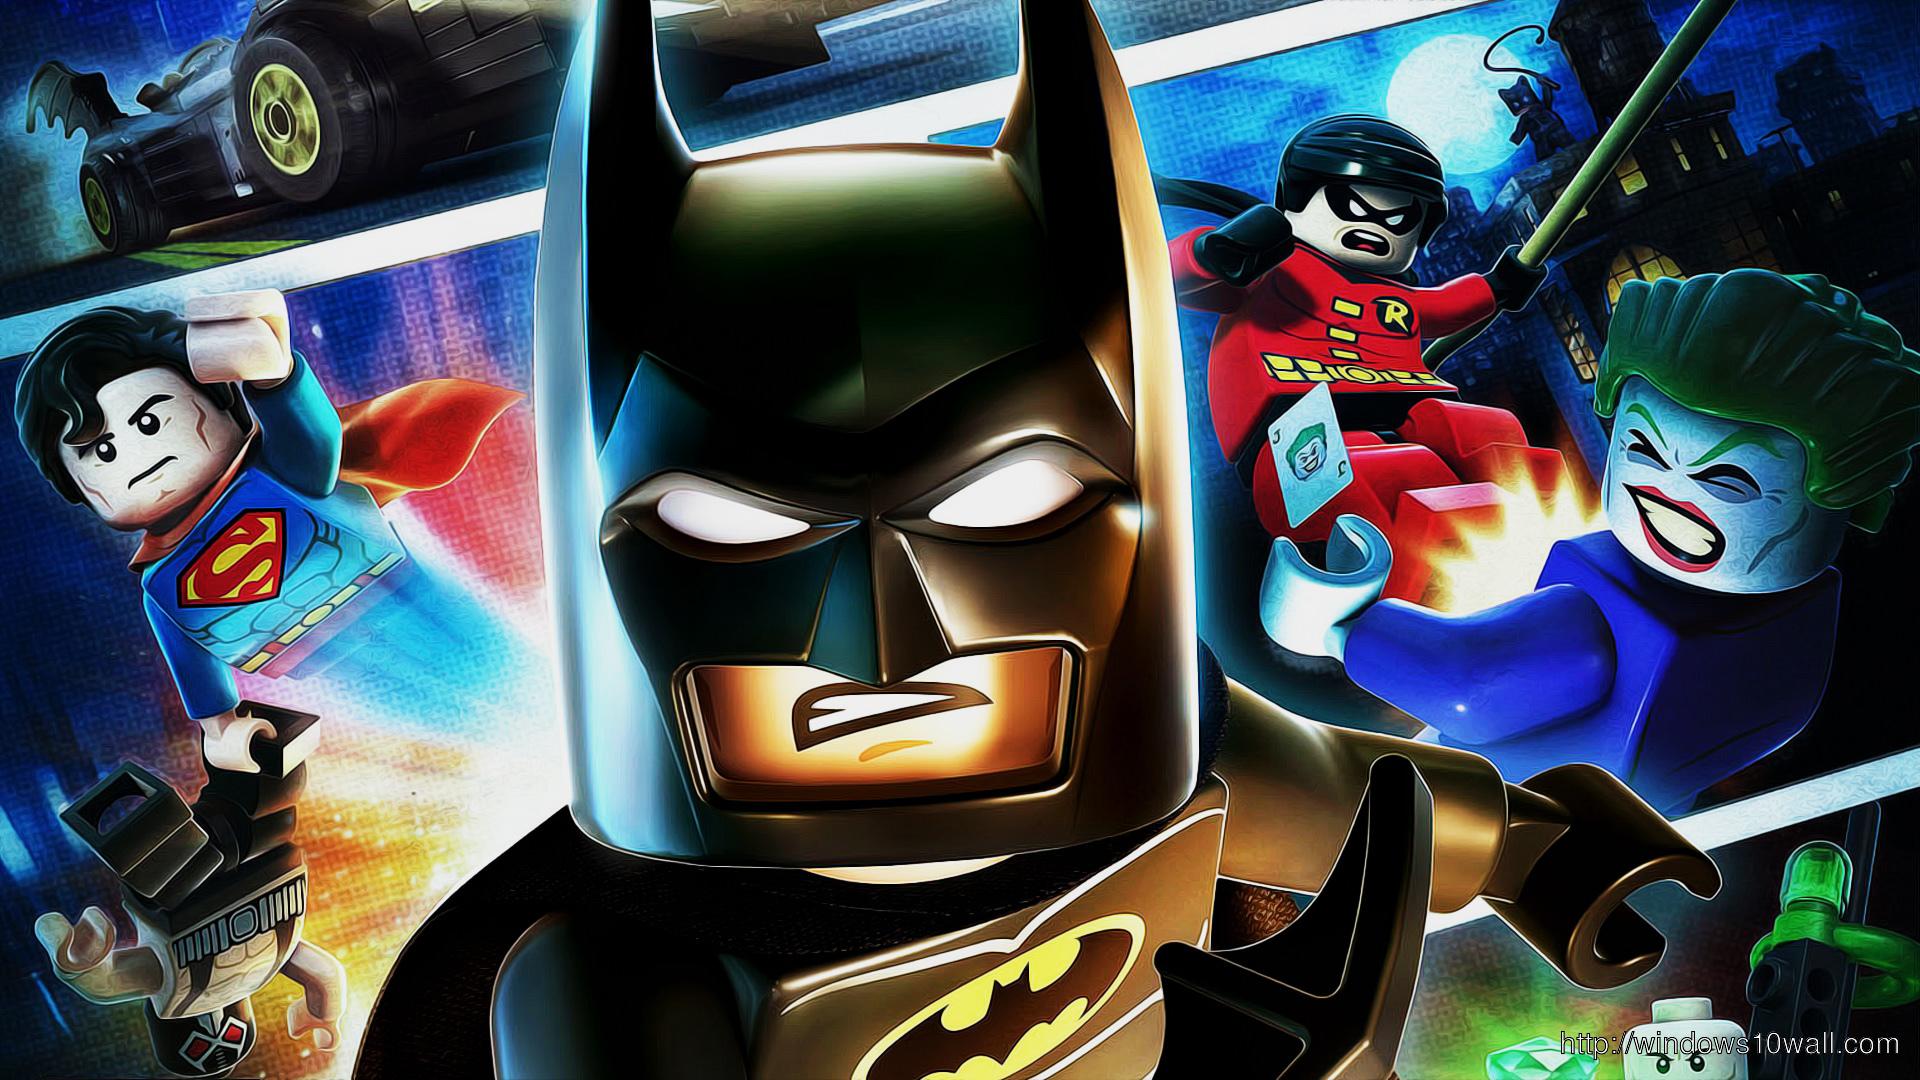 batman--the-lego-movie-ideas-background-wallpaper